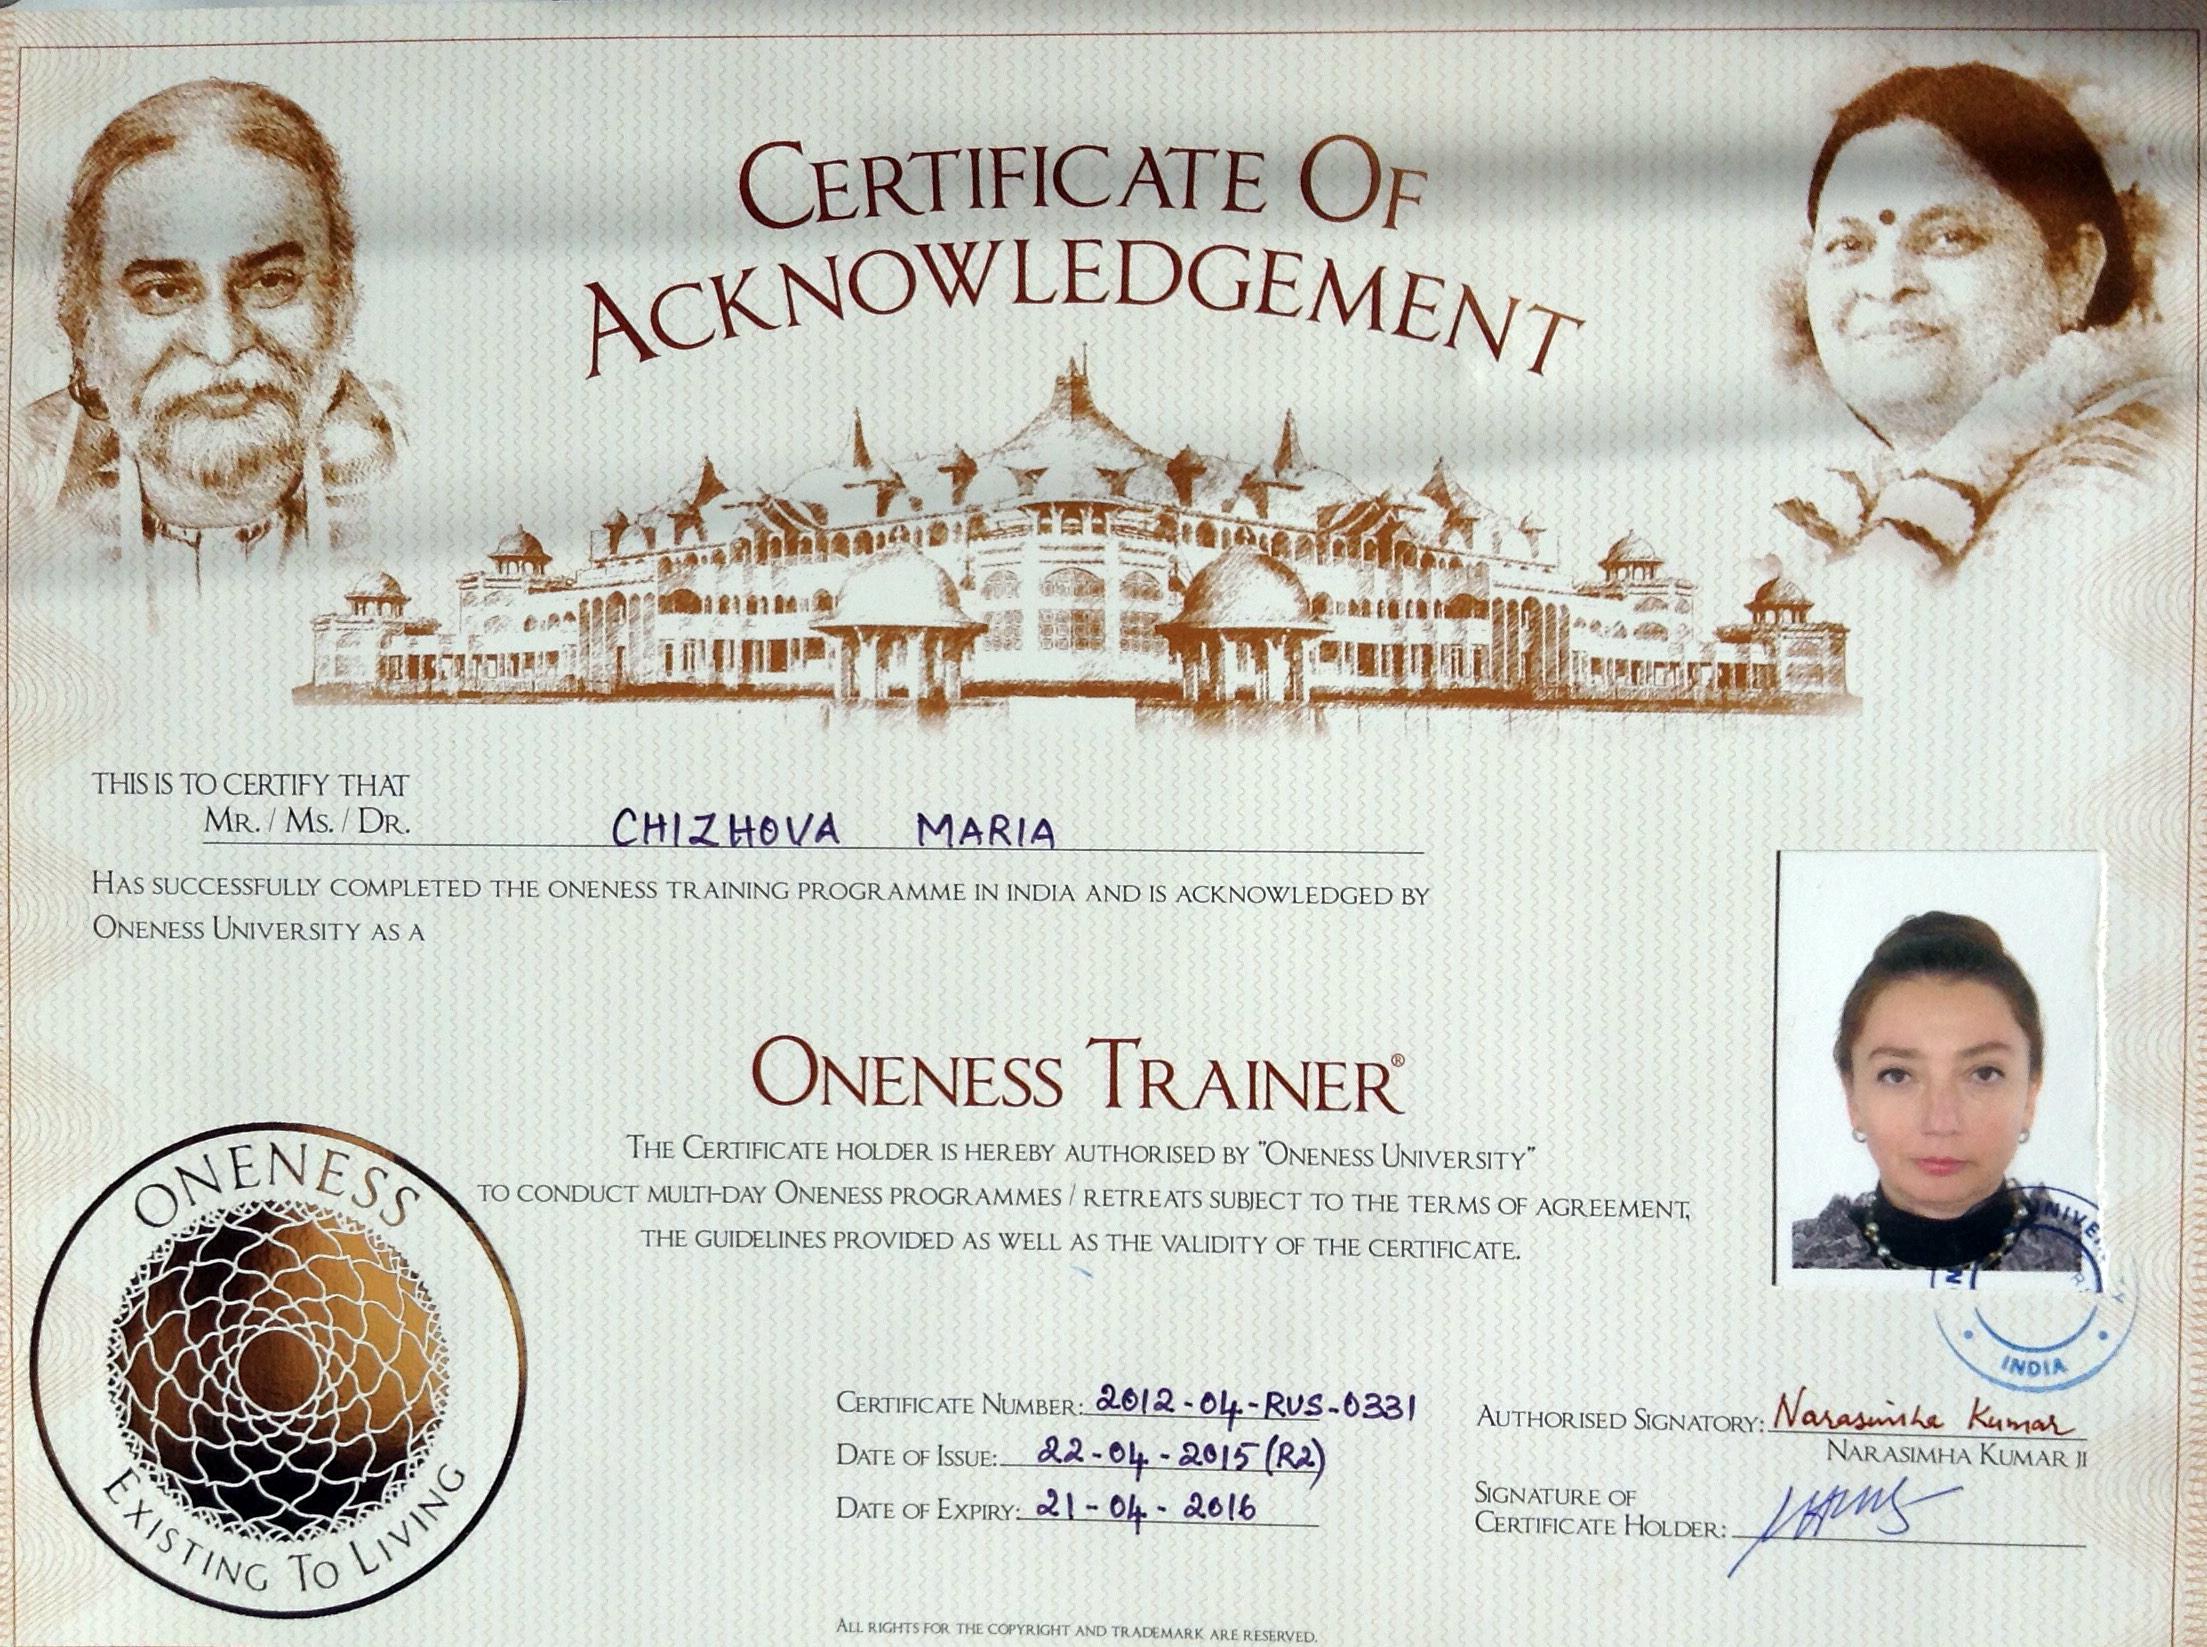 Мария Чижова Сертификат 1